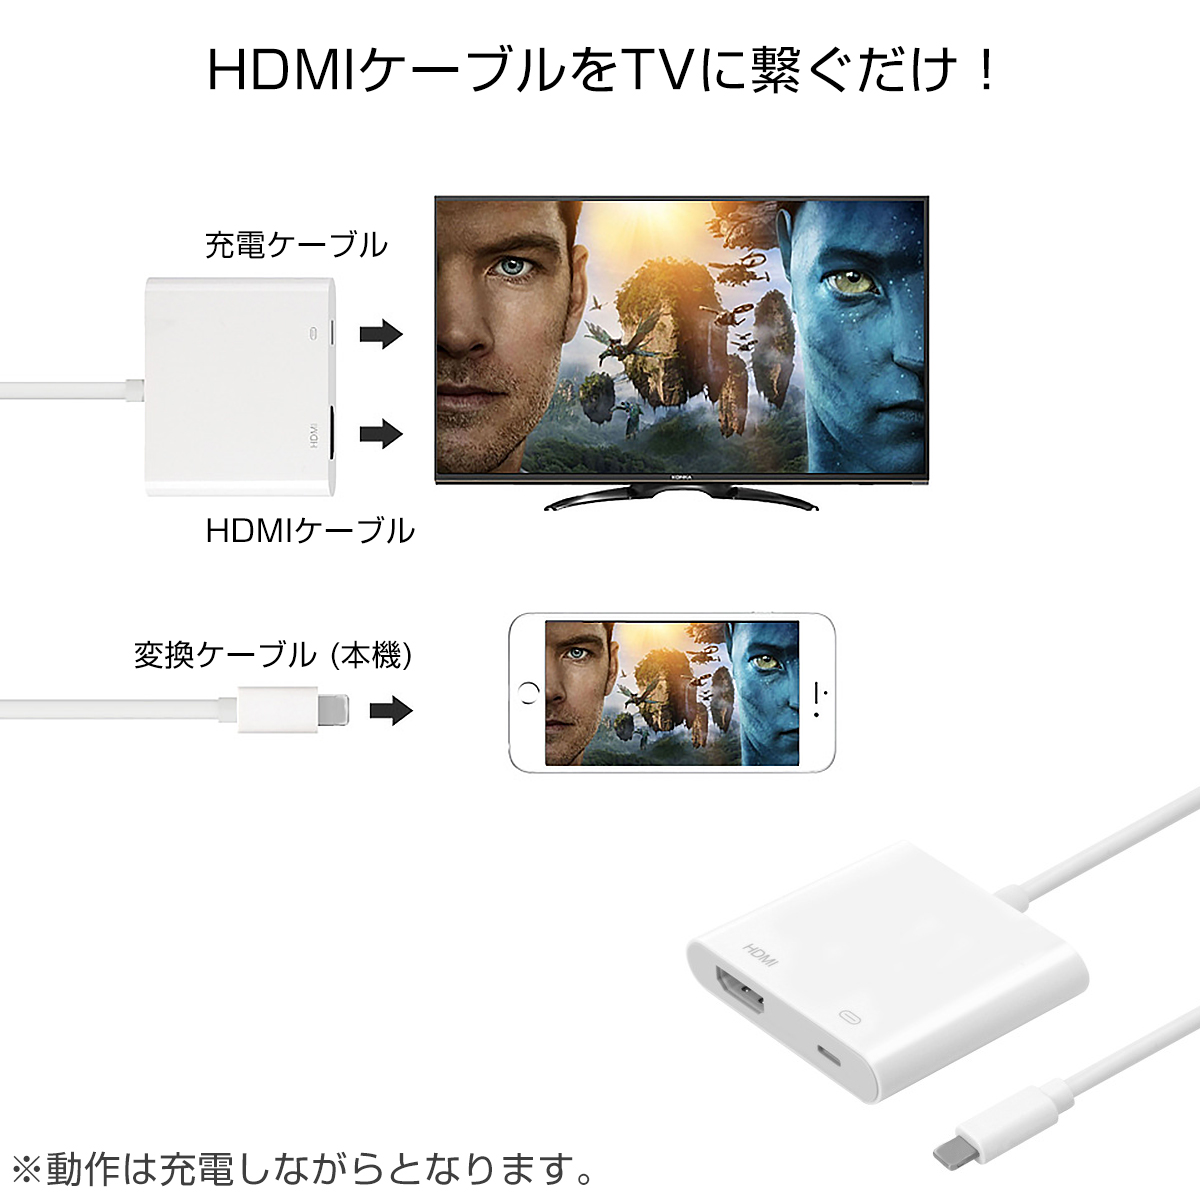 iPhone HDMI テレビ 接続 ケーブル lightning 変換 アダプター 充電 同時 簡単接続 カーナビ フルHD 1080P 高画質 iPhone/iPad SDM便送料無料 1ヶ月保証